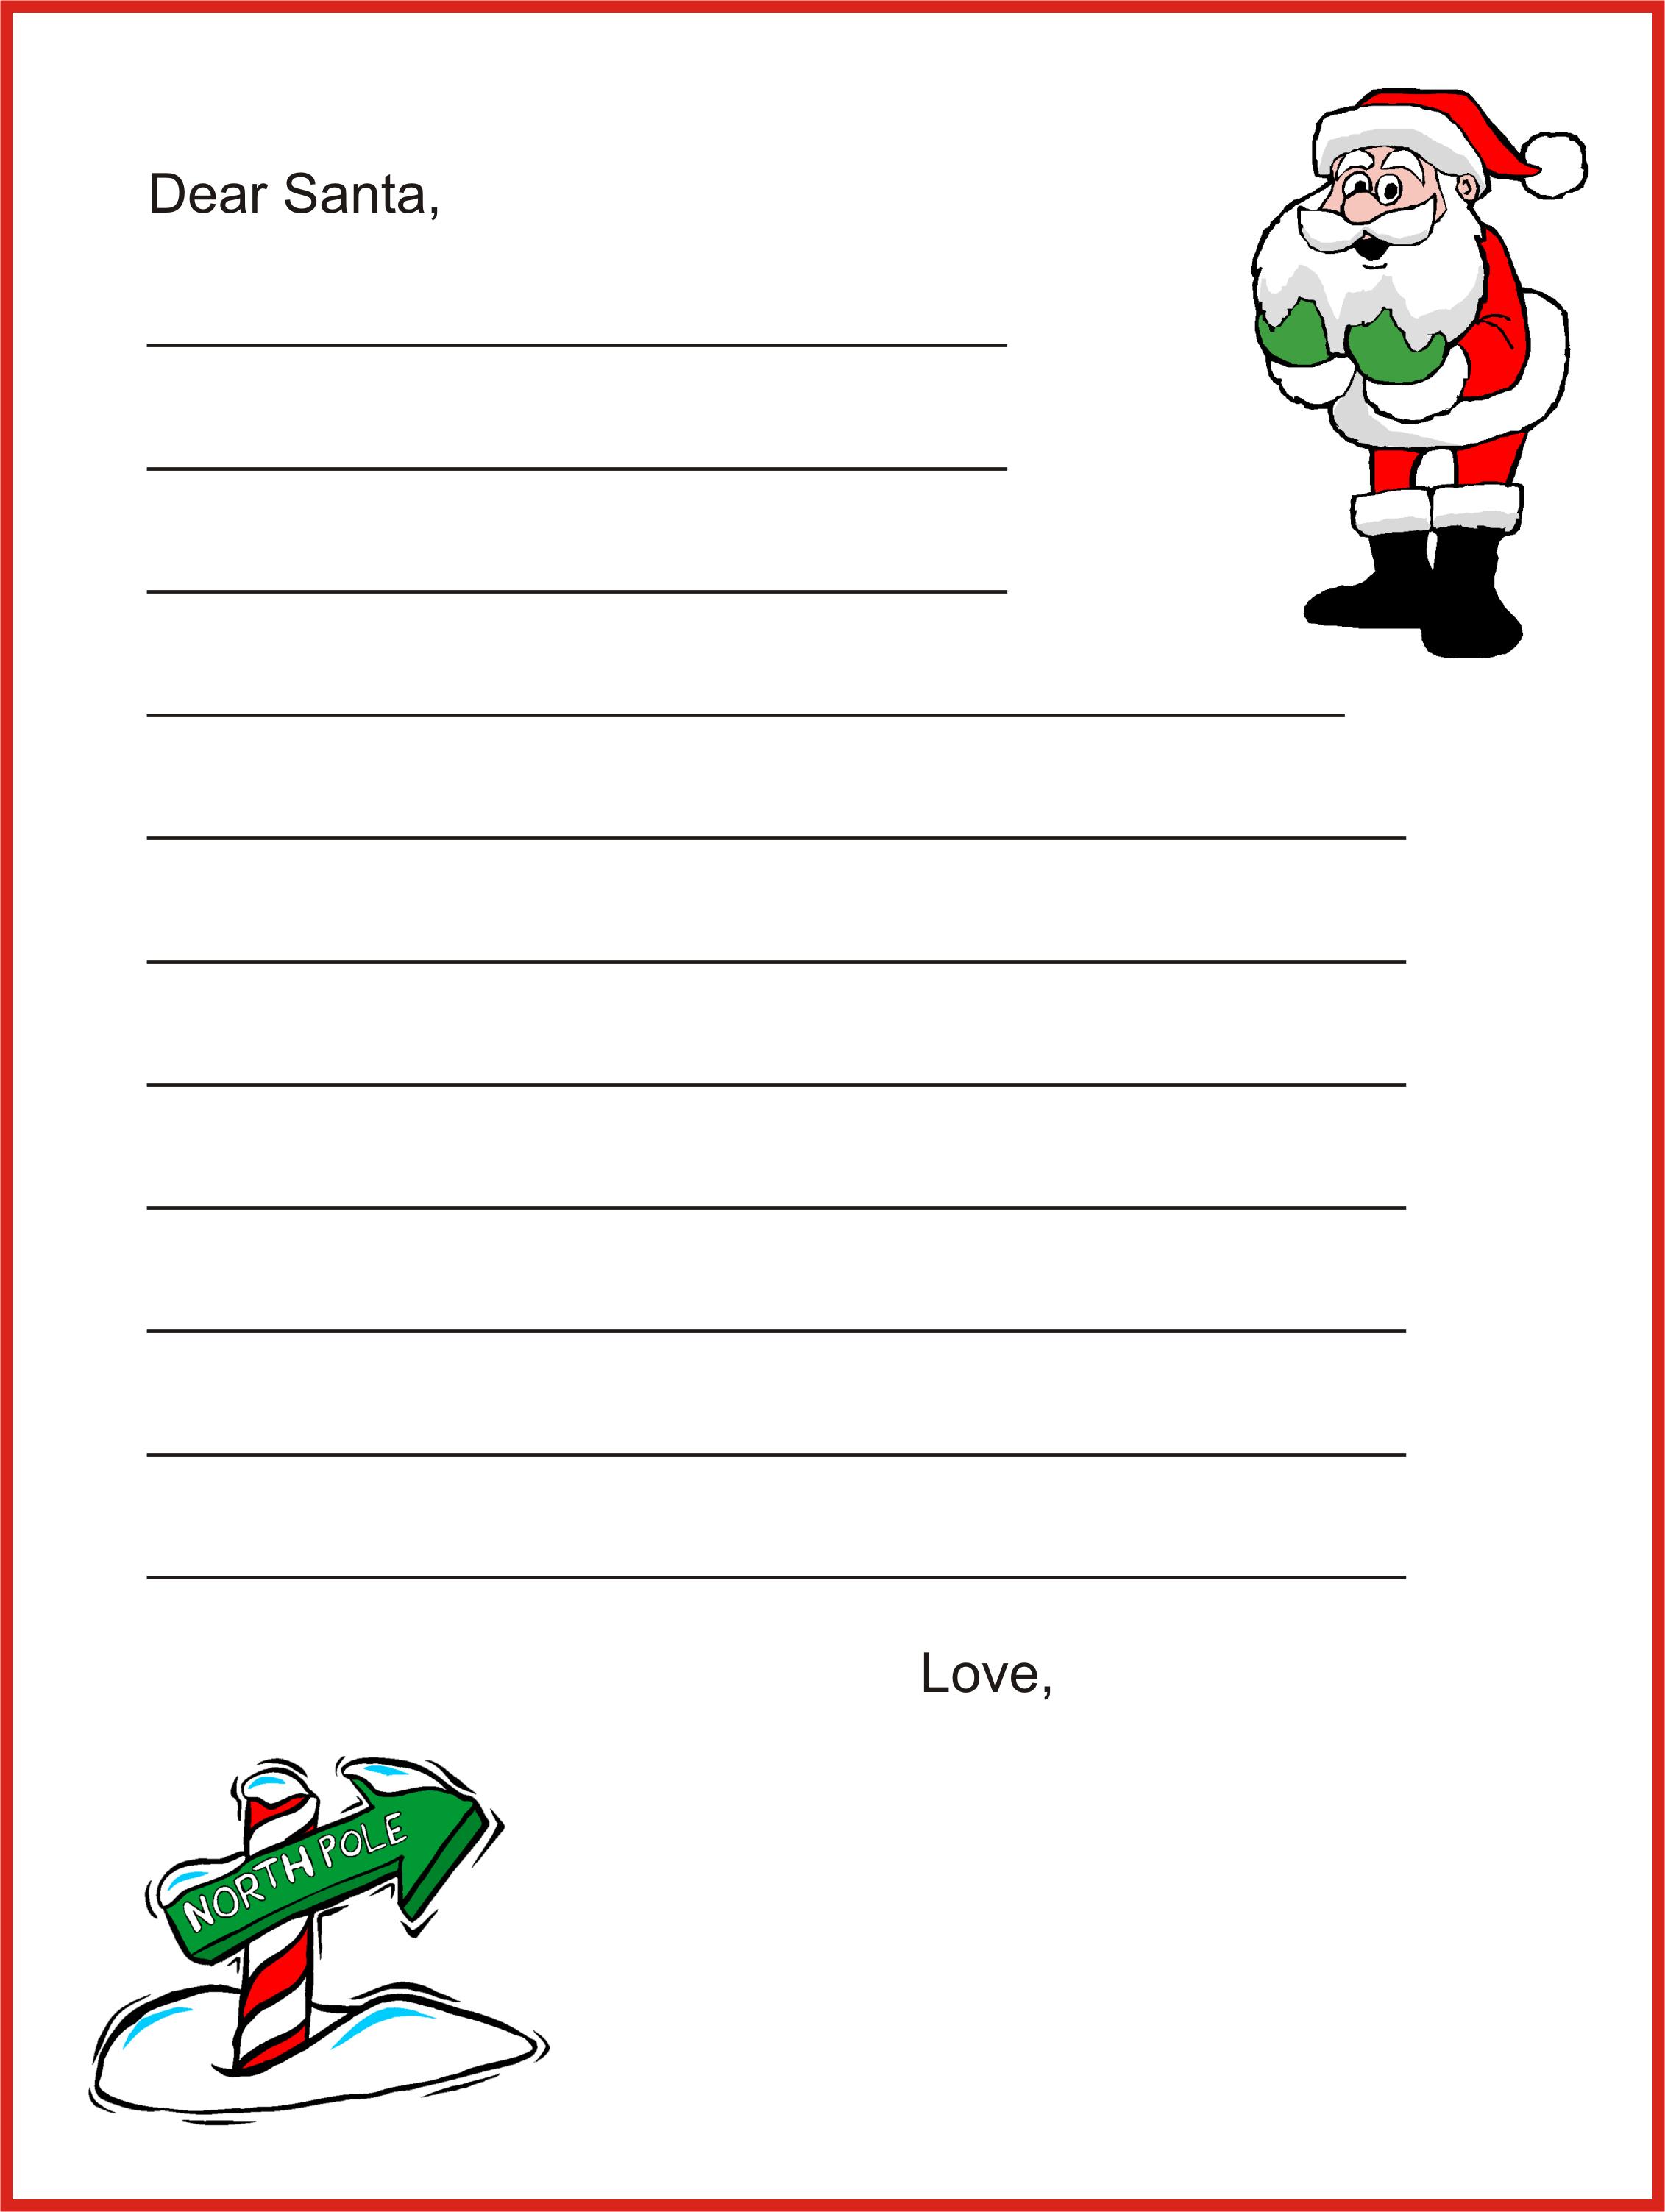 Dear Santa Letter Template - Christmas Letter Tips | - Free Printable Dear Santa Stationary